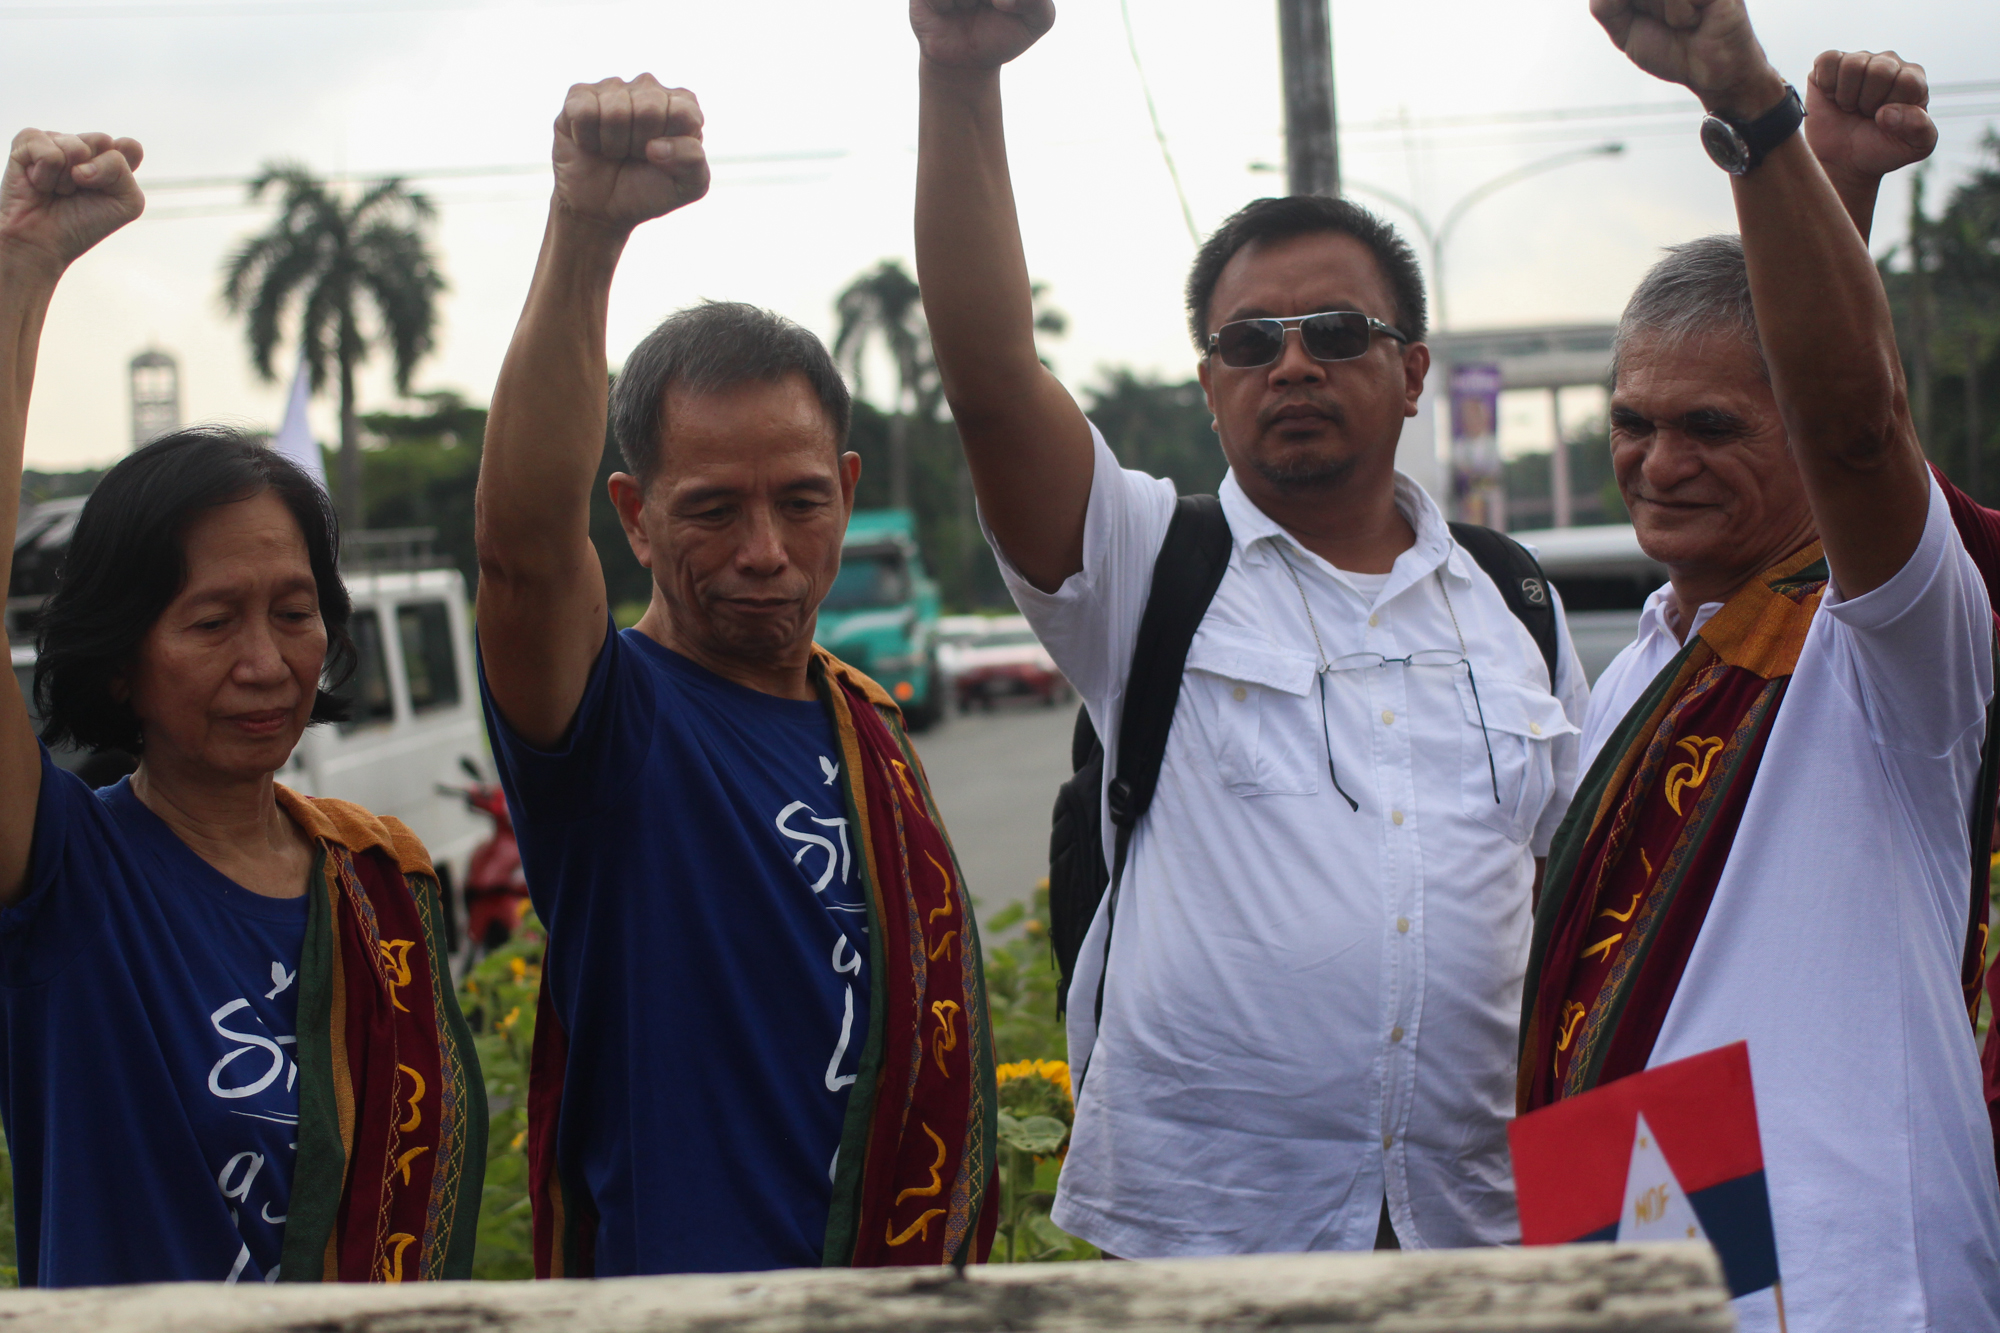 L-R: NDFP peace consultants Wilma Austria-Tiamzon, Benito Tiamzon, Randy Malayao, and Jaime Soledad in front of the Diliman Commune marker along University Avenue (Photo by Gino Estella/Bulatlat)